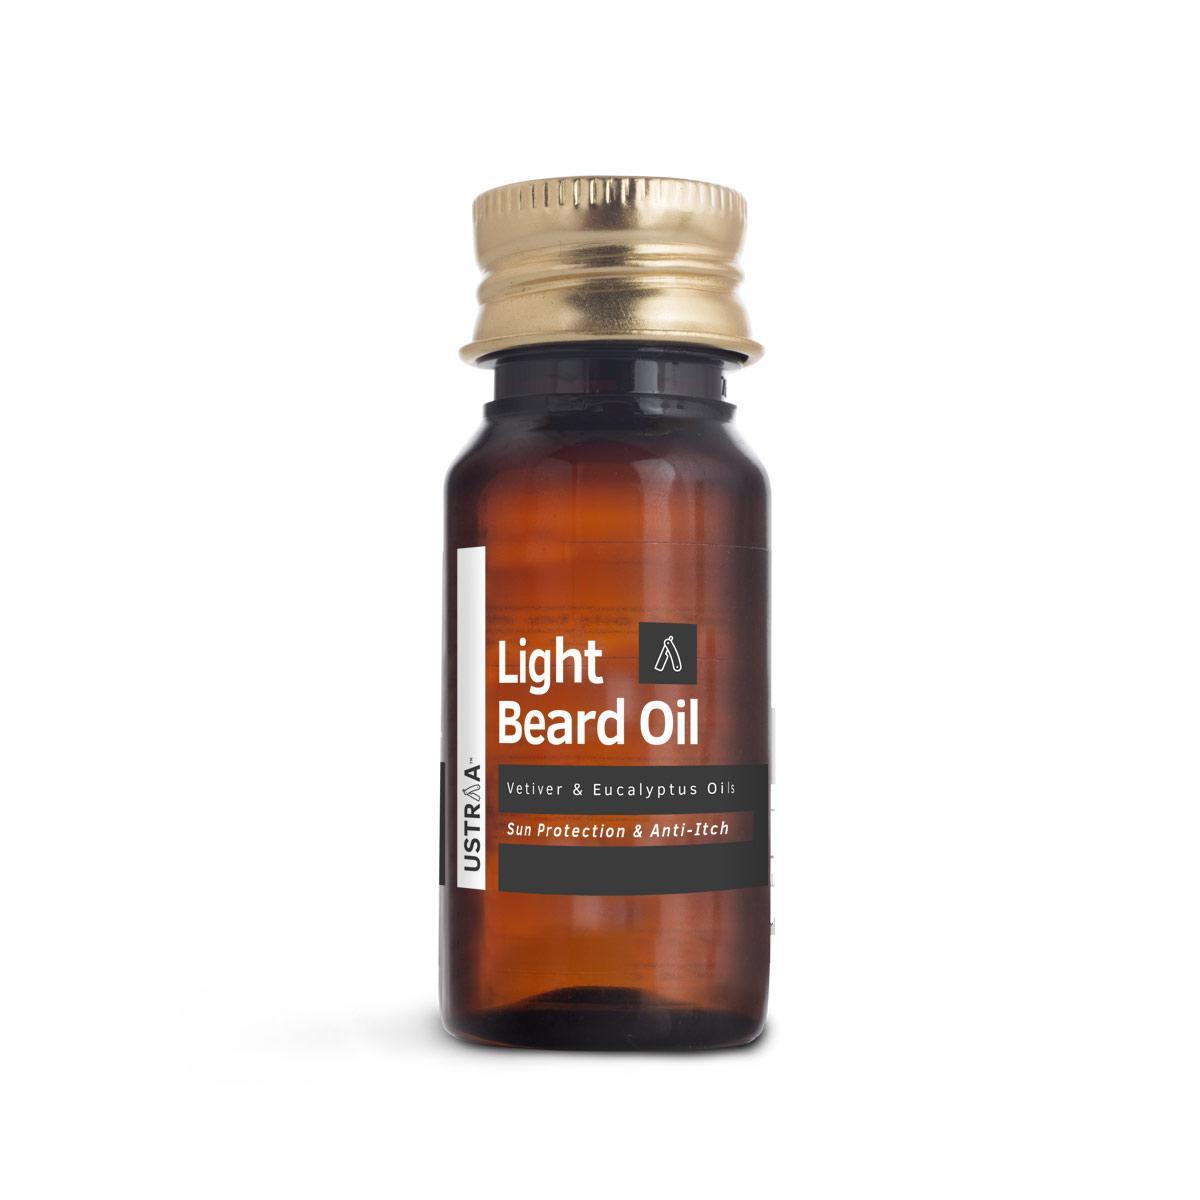 Ustraa Light Beard Oil for Men 35ml - Non Sticky and Quick Absorbing Formulation